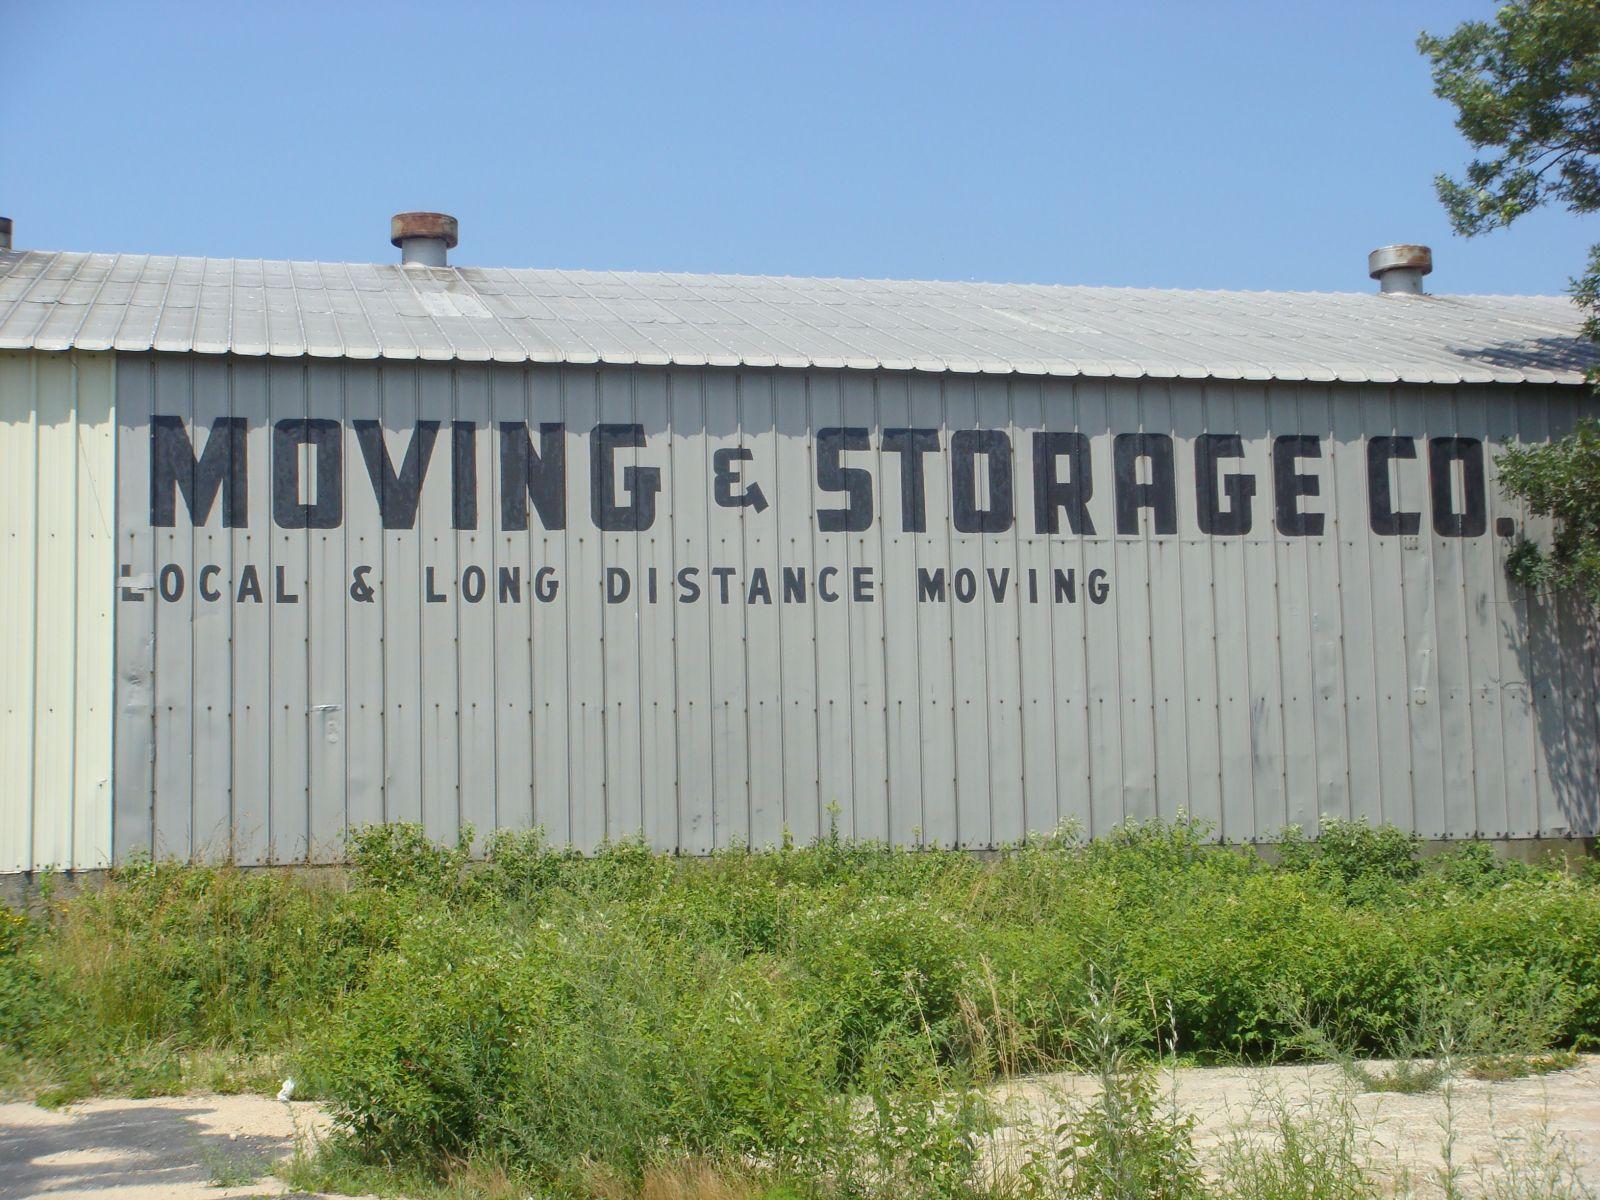 Moving & Storage Co.   Bearses Way, Hyannis   Nick Sherman   Flickr